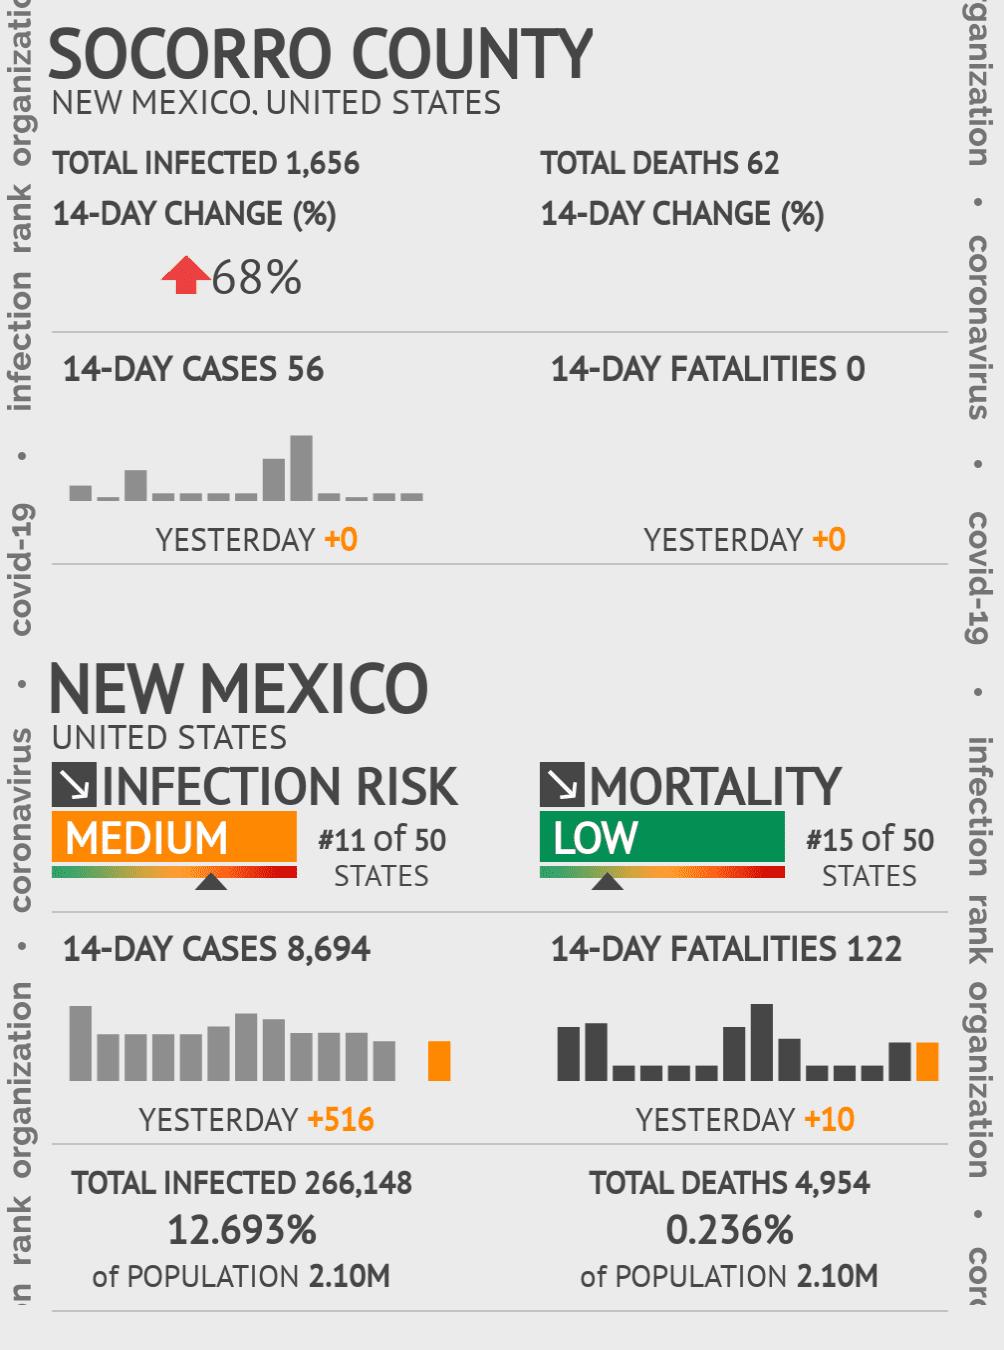 Socorro County Coronavirus Covid-19 Risk of Infection on July 24, 2021